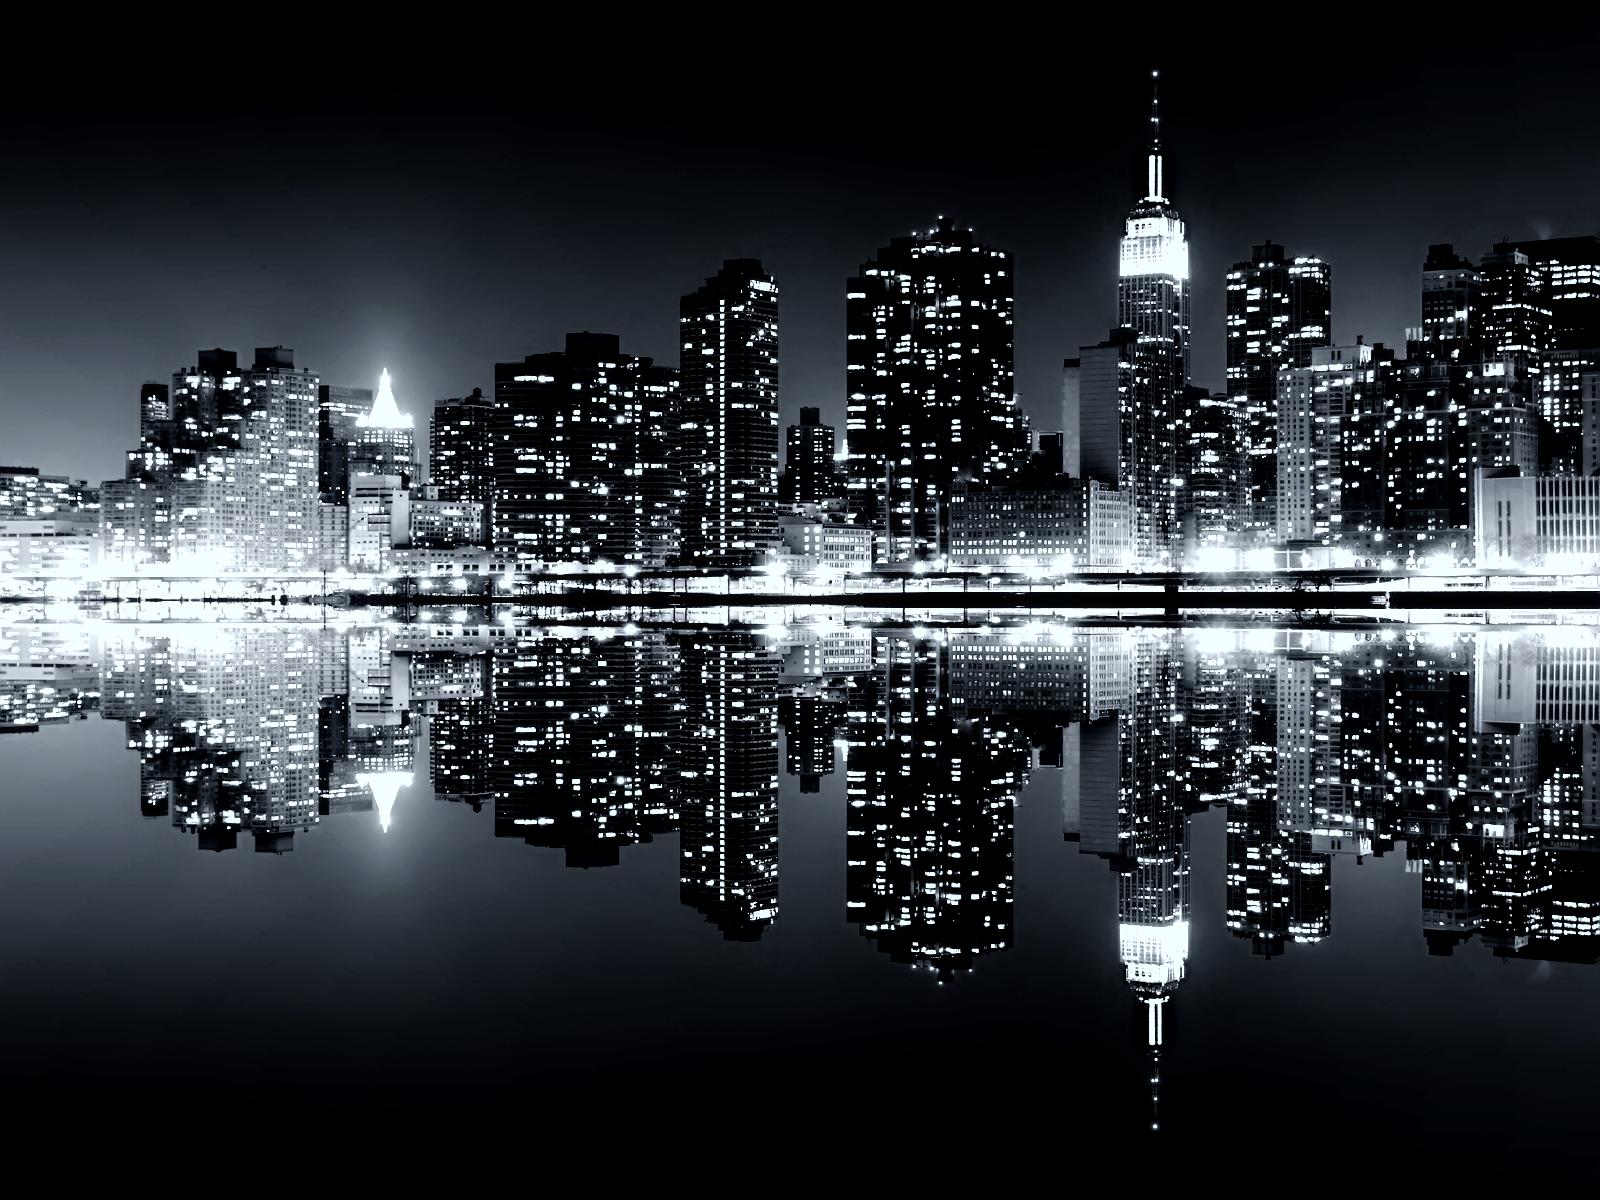 New+york+night+skyline+wallpaper